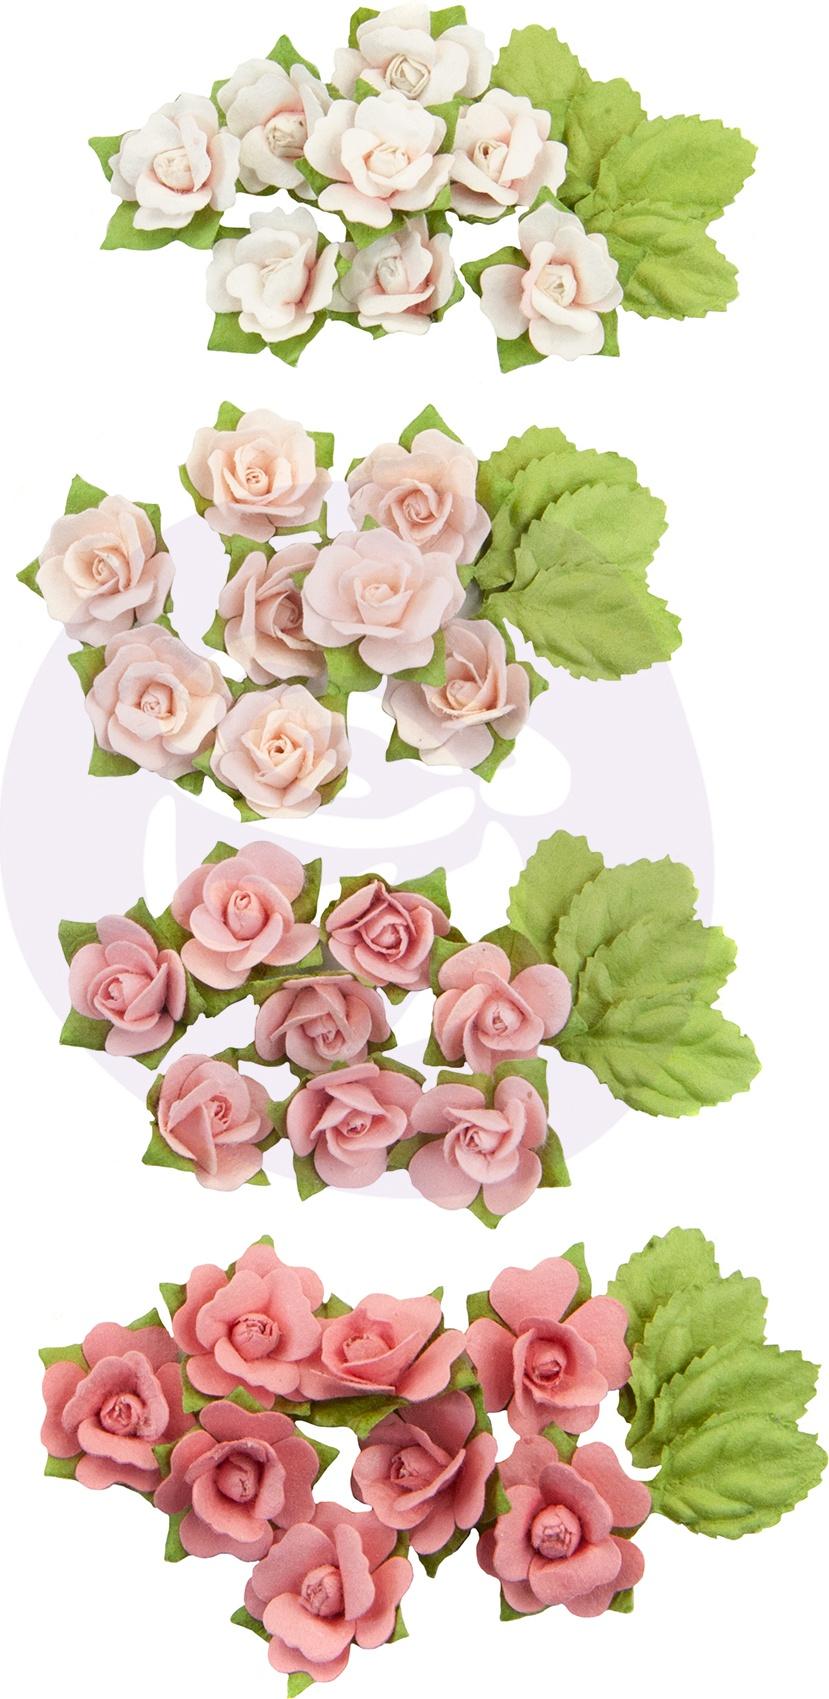 Prima Marketing Mulberry Paper Flowers  -Raspberry Kisses/Fruit Paradise, 48/Pkg